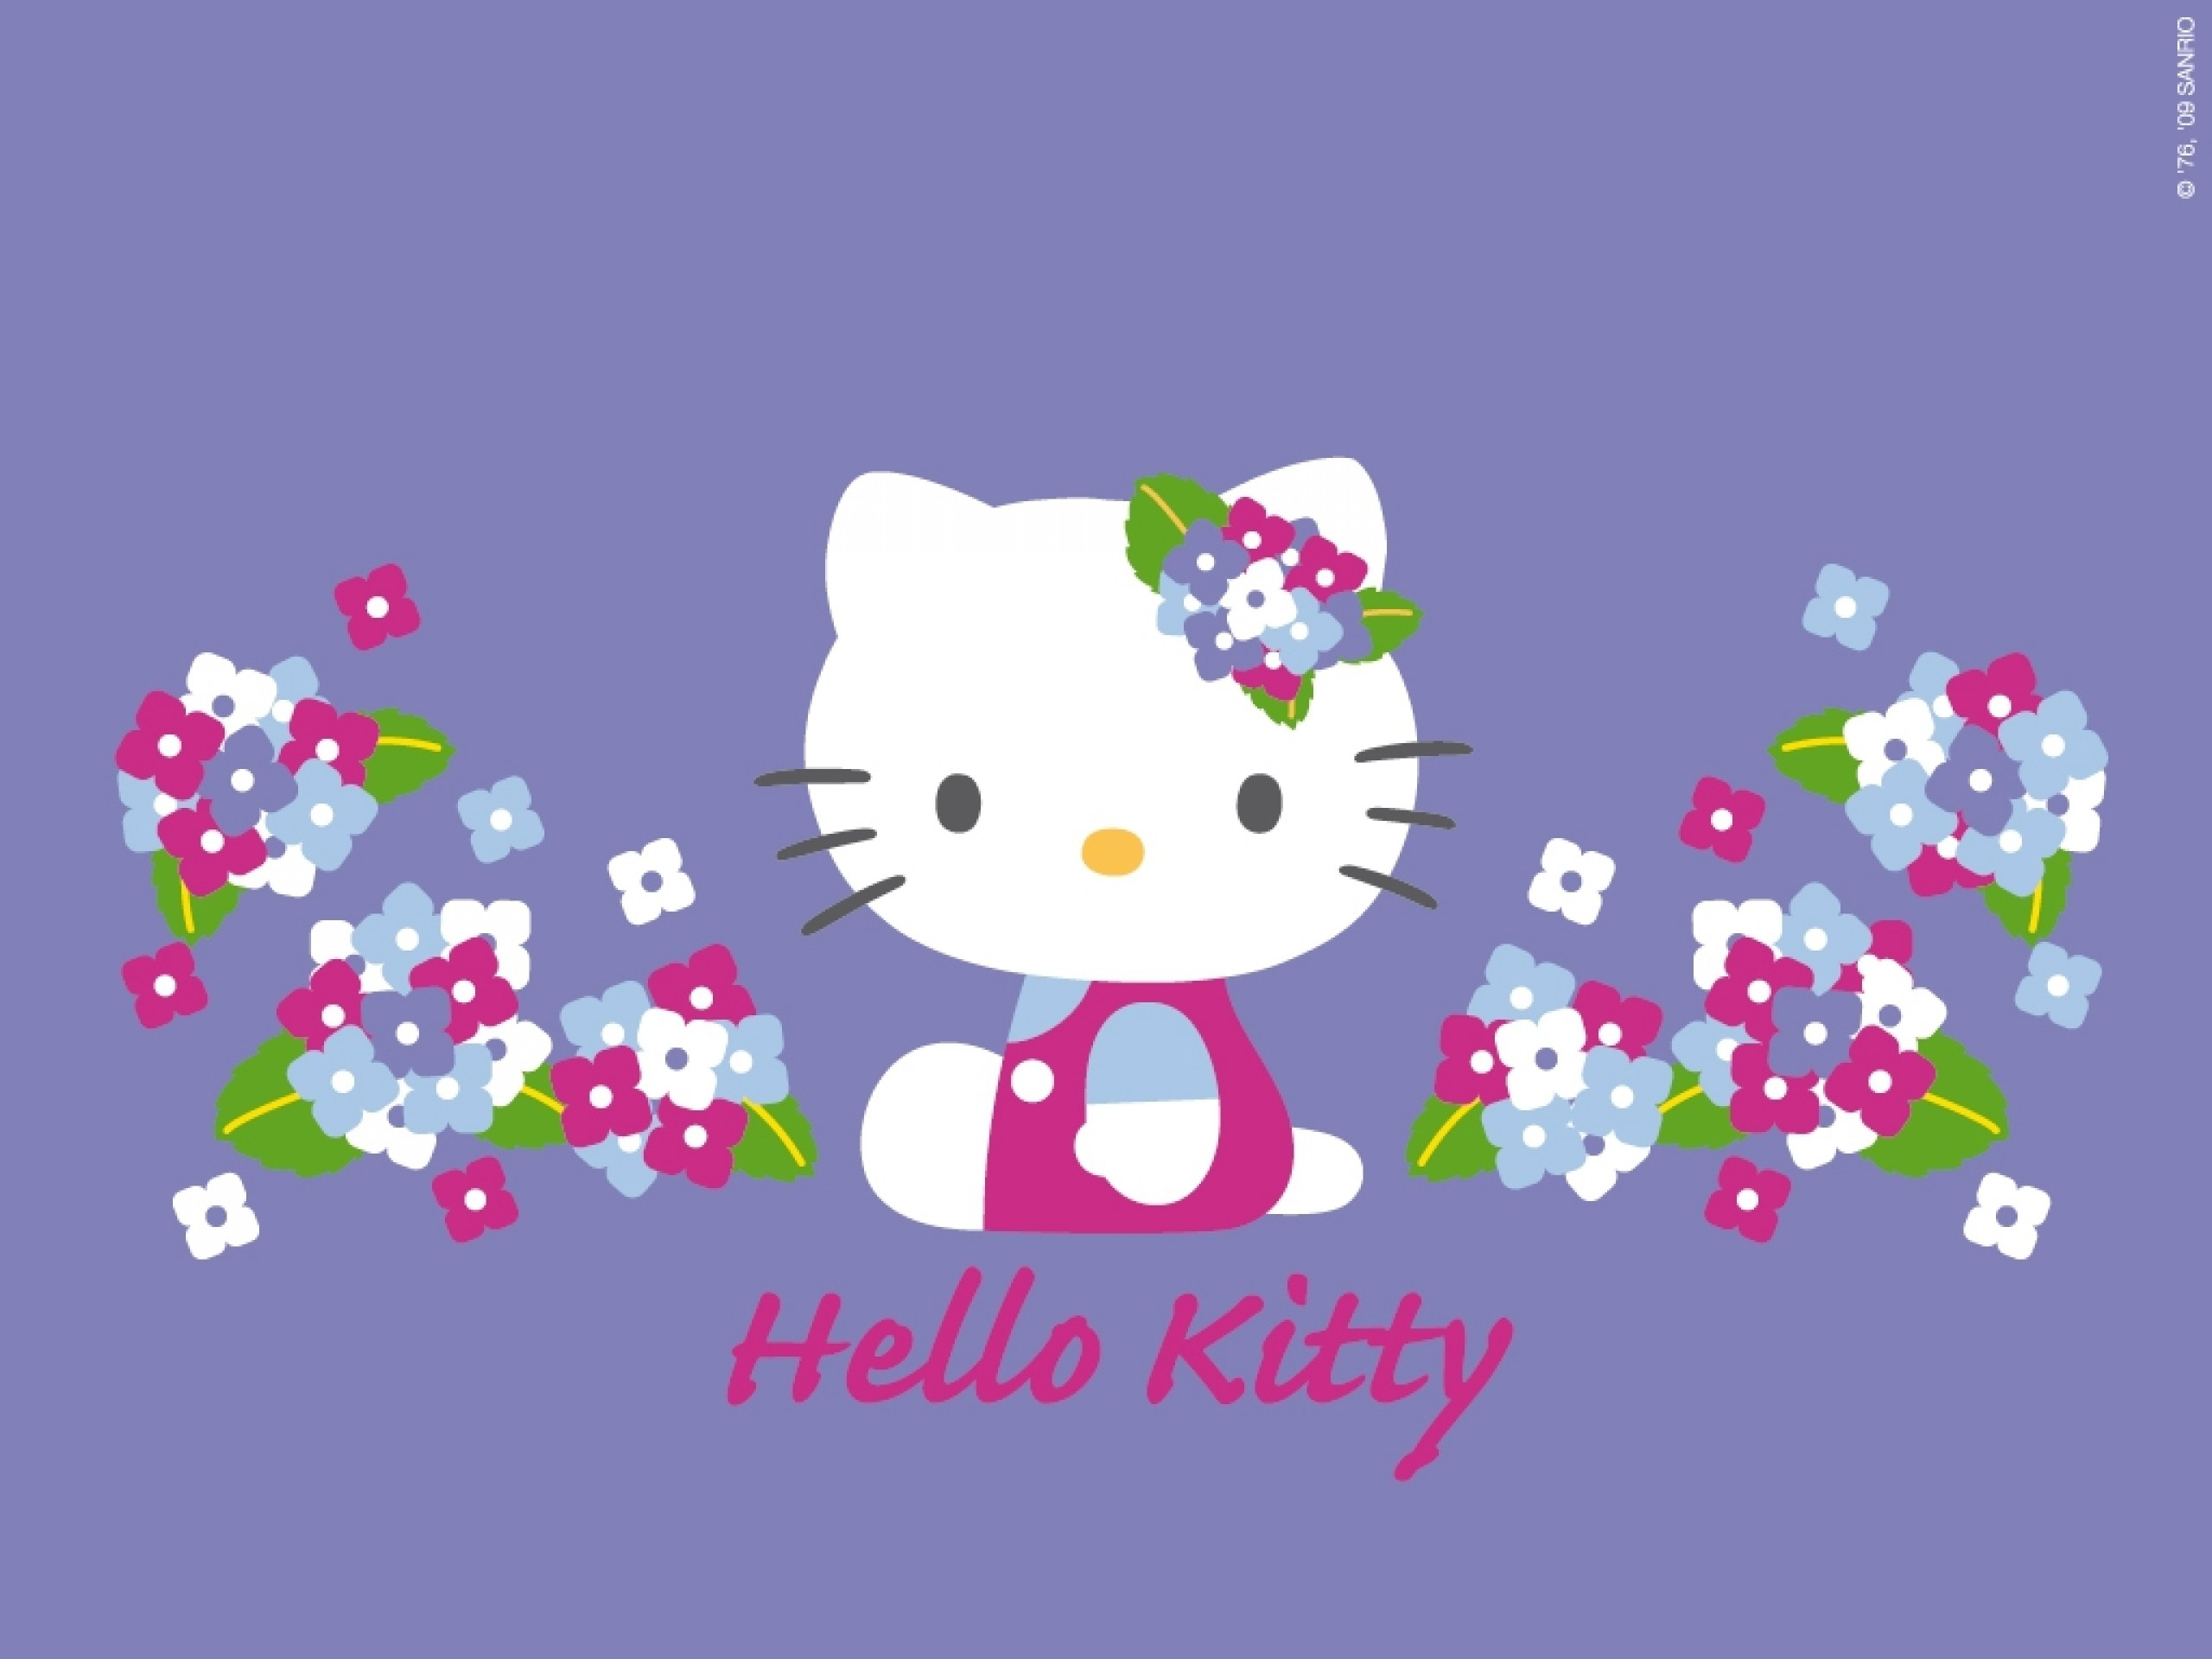 Good Wallpaper Hello Kitty Panda - 815837-wallpaper-hello-kitty-gif-2560x1920-meizu  HD_198668.jpg